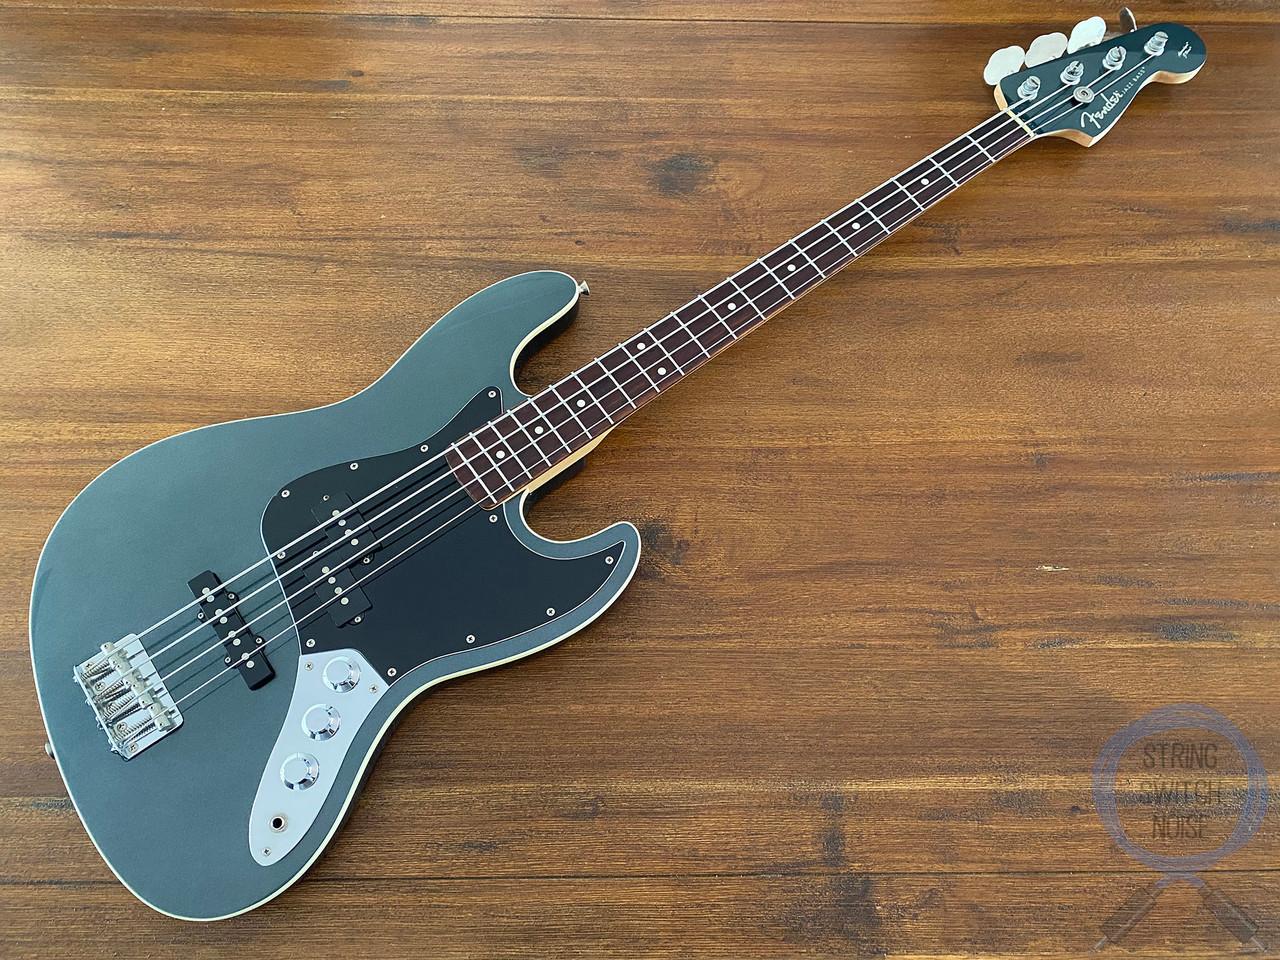 Fender Jazz Bass, Aerodyne, Dolphin Grey, 2004